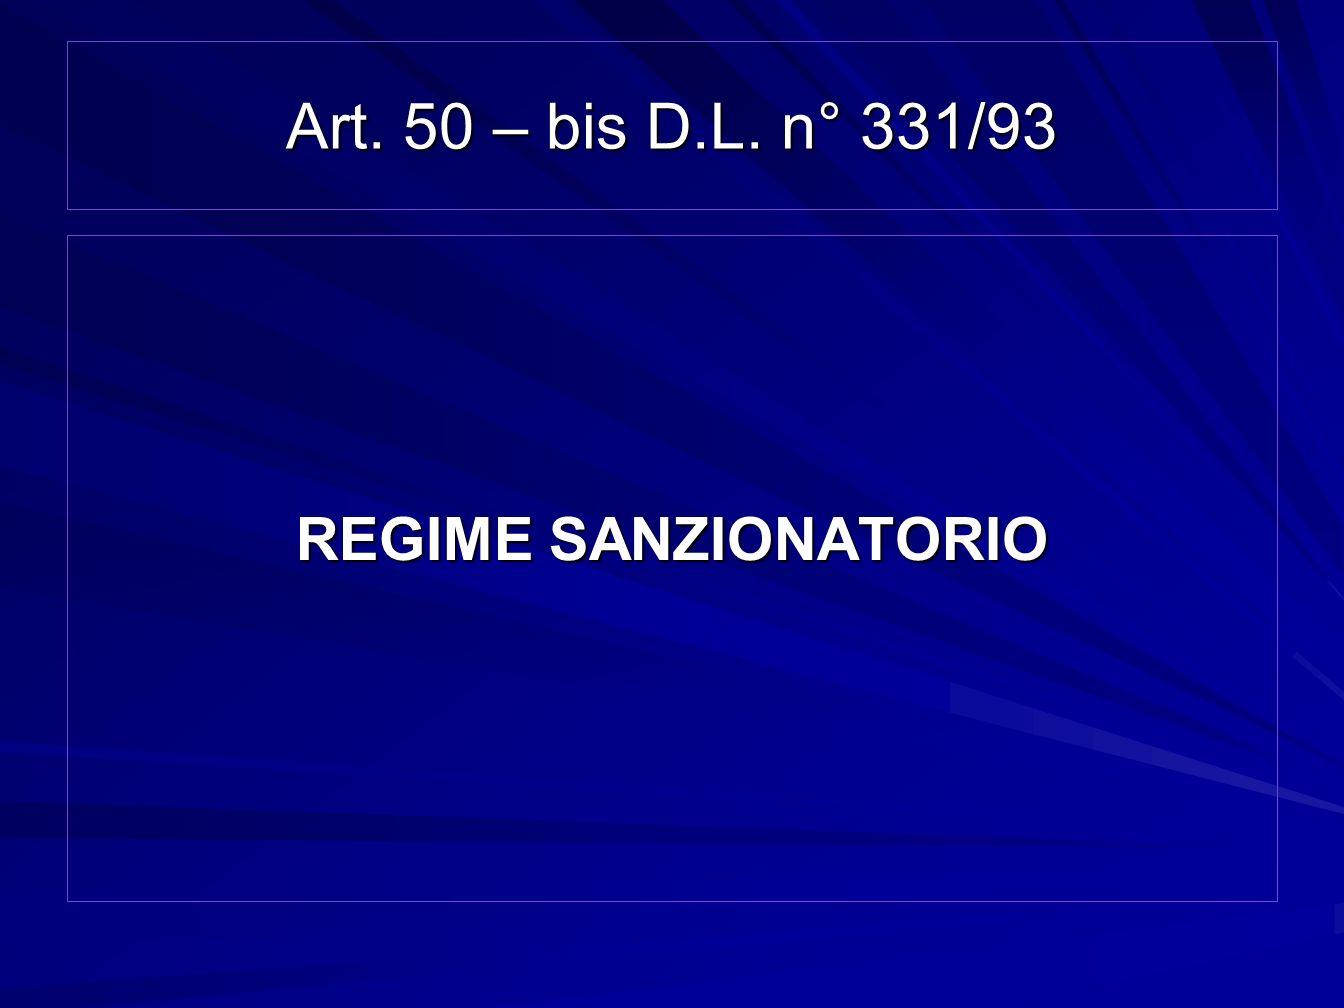 Art. 50 – bis D.L. n° 331/93 REGIME SANZIONATORIO